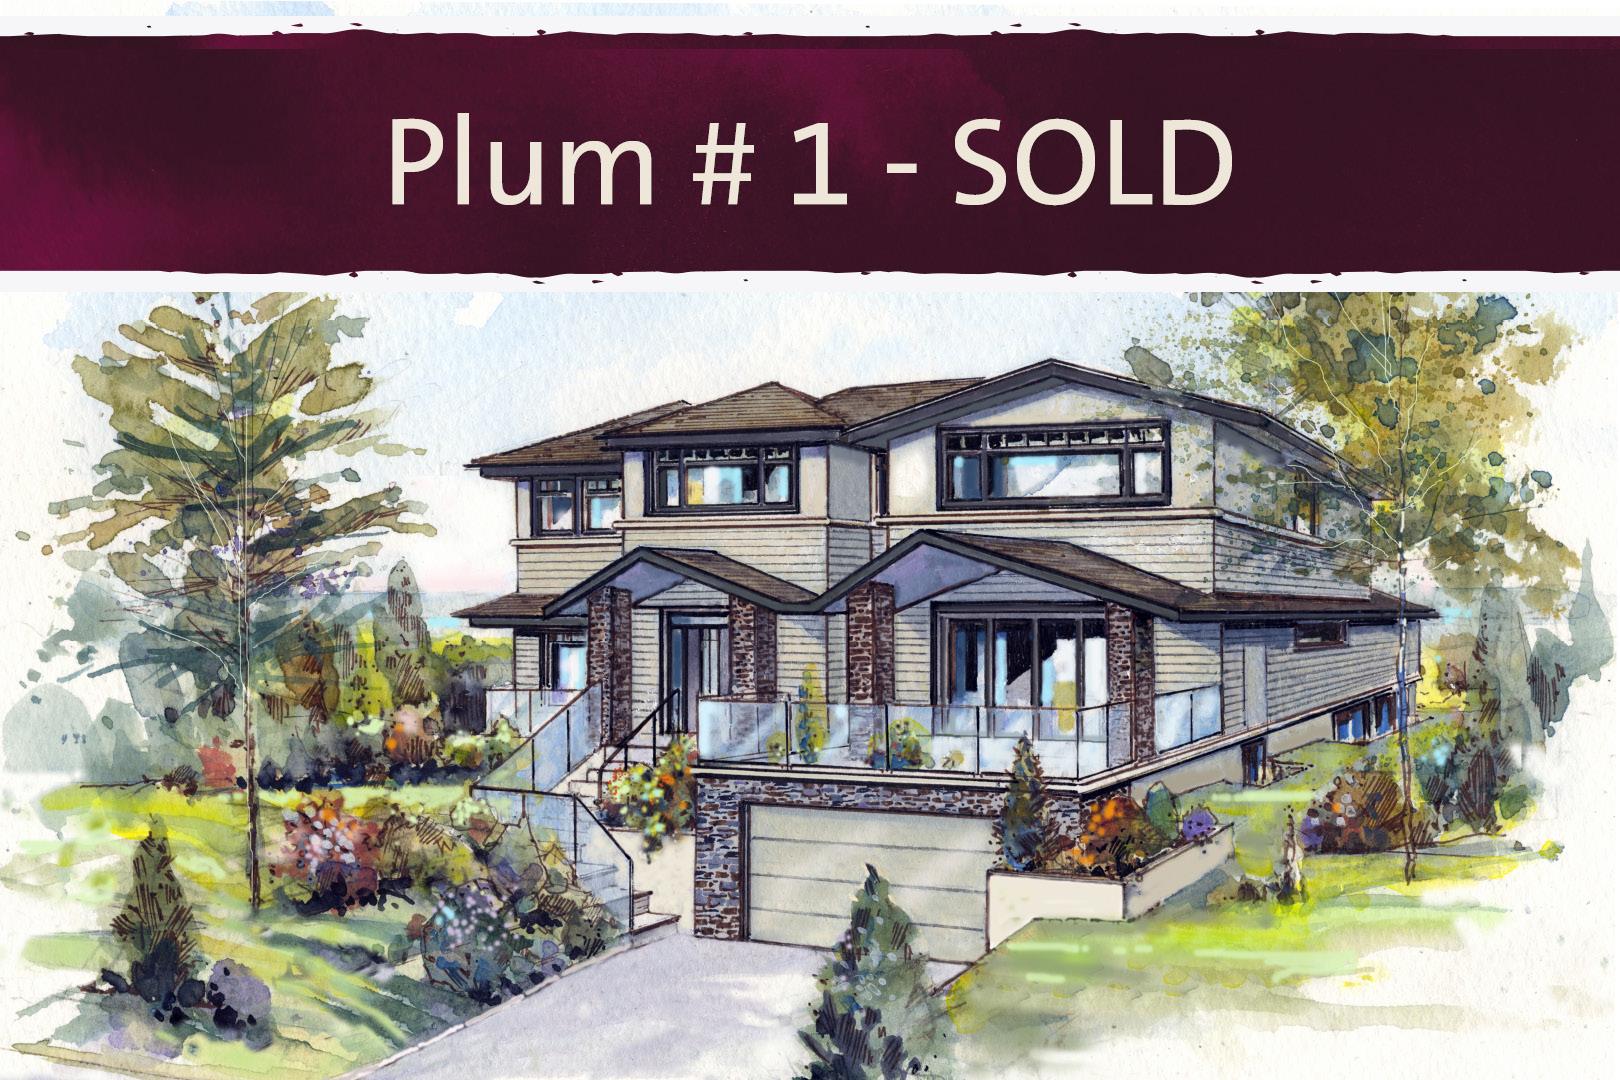 10 Plums Sold Homes version 22.jpg